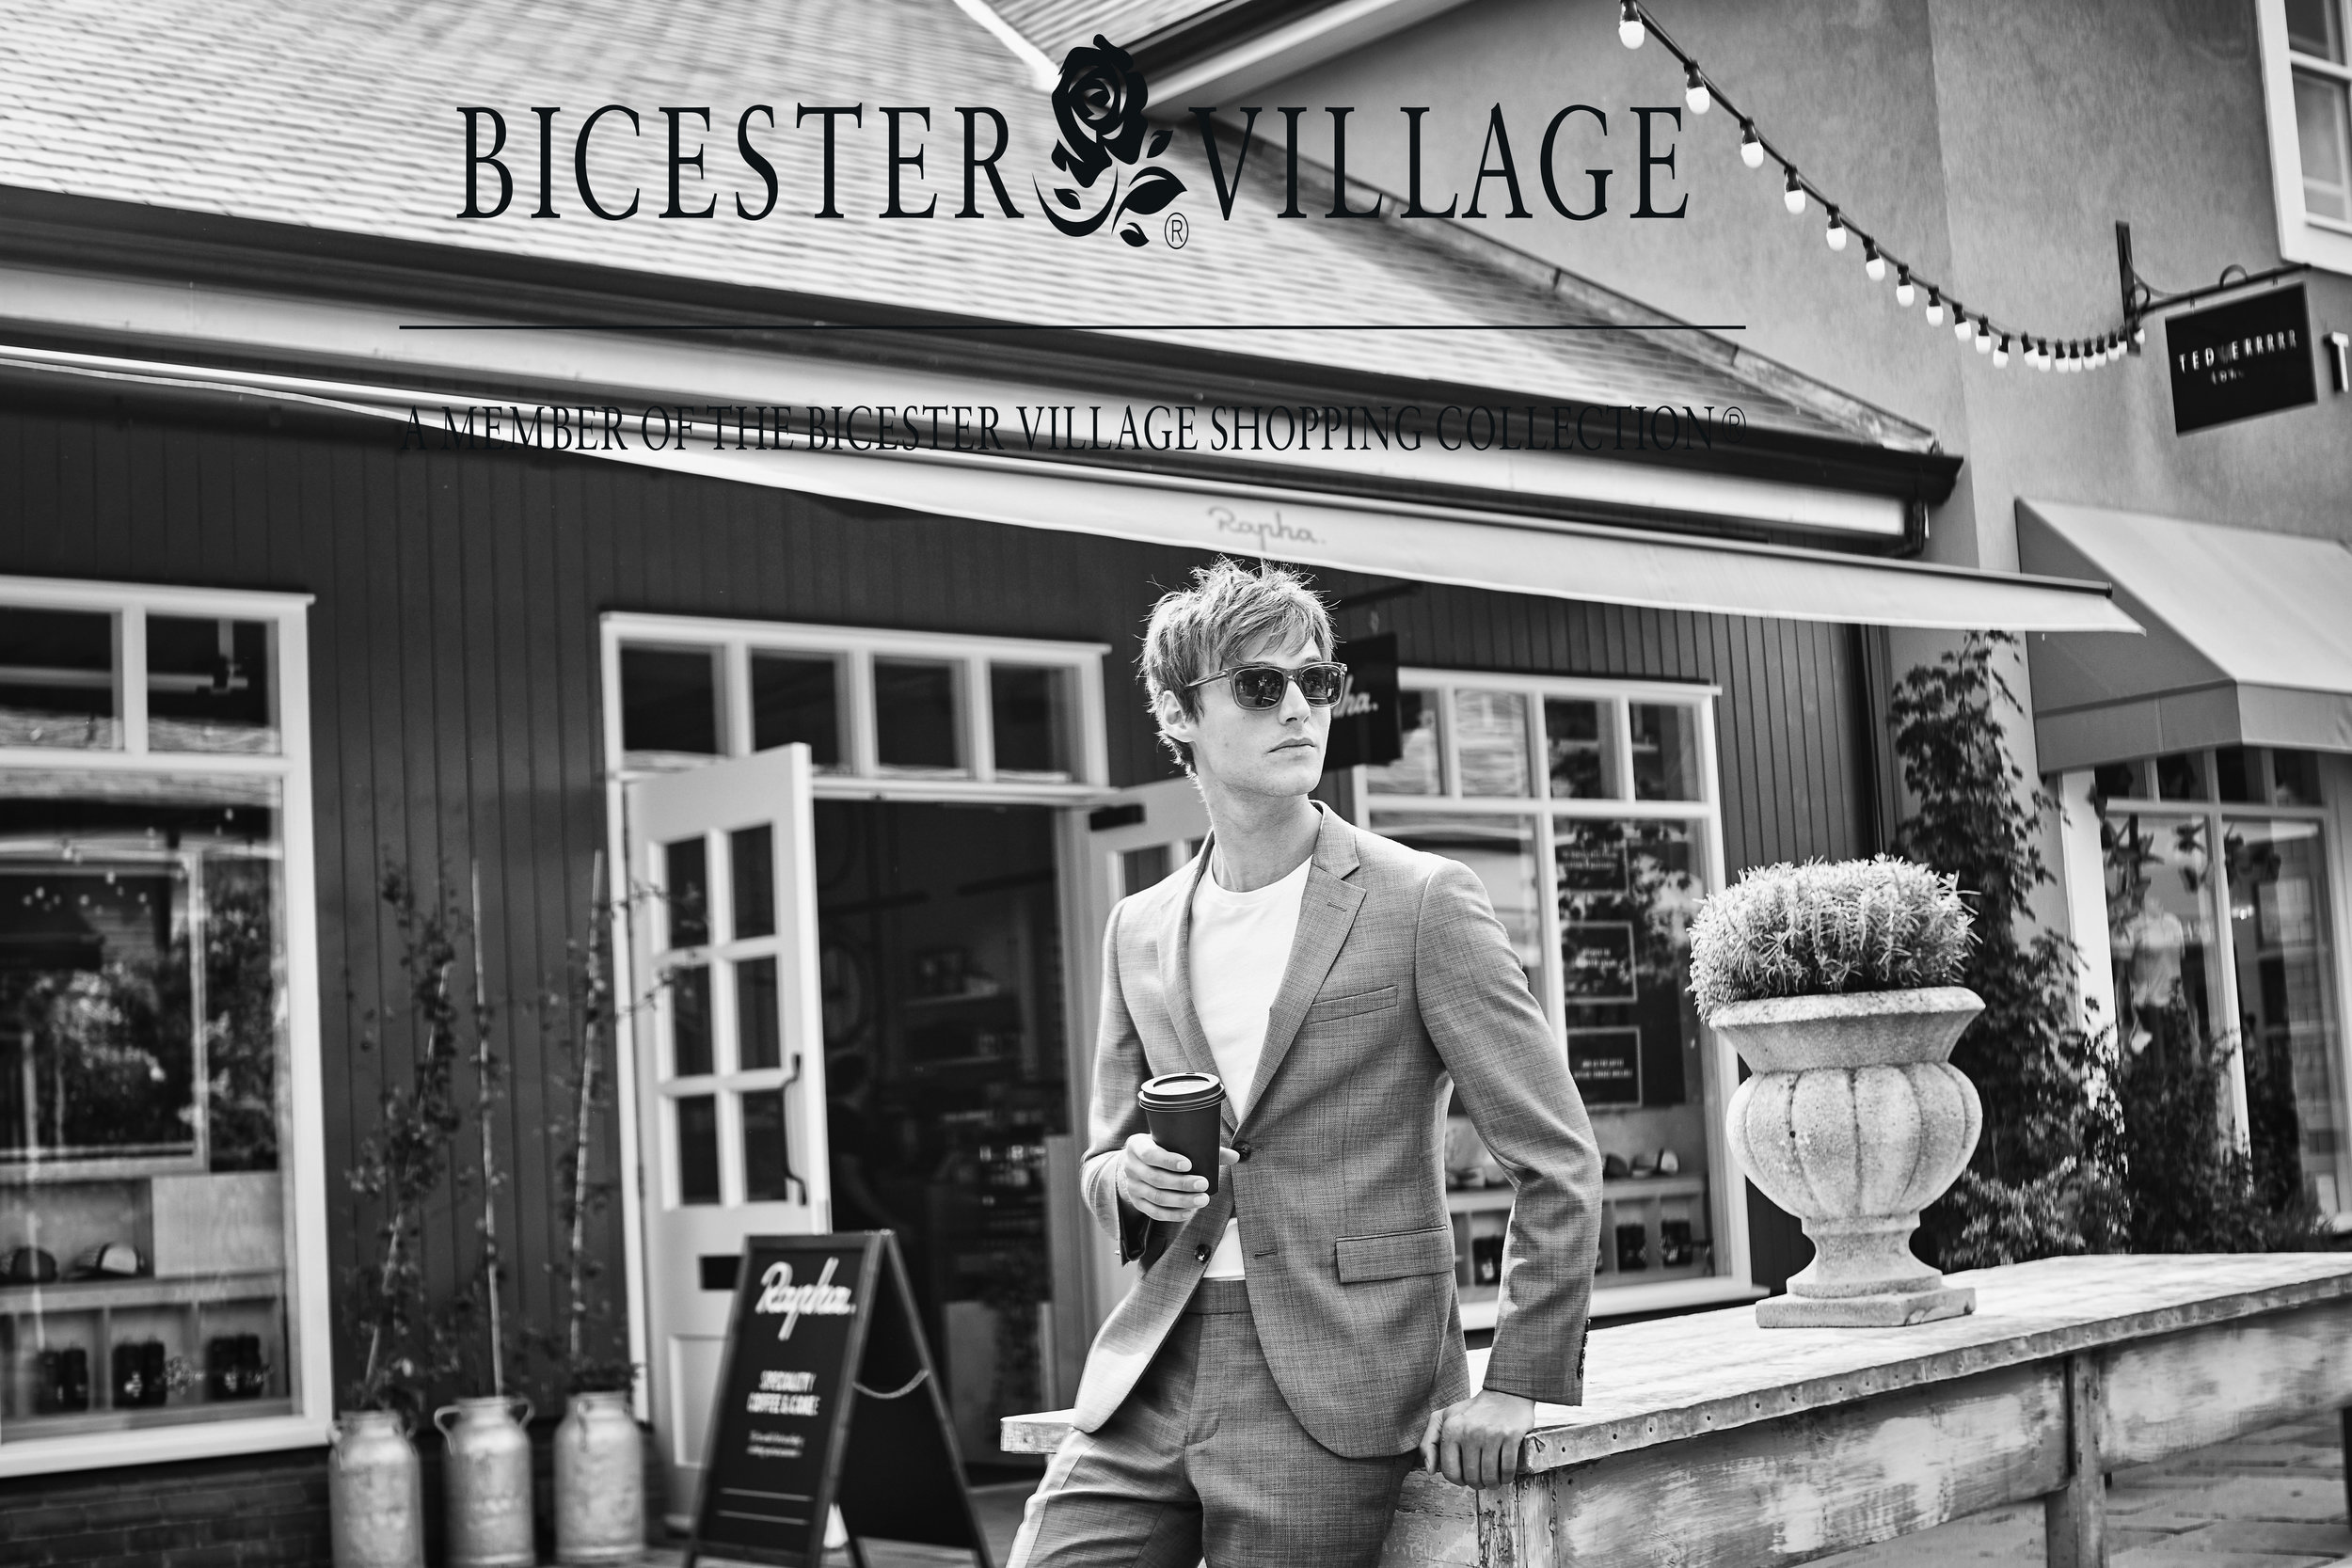 bicester8.jpg